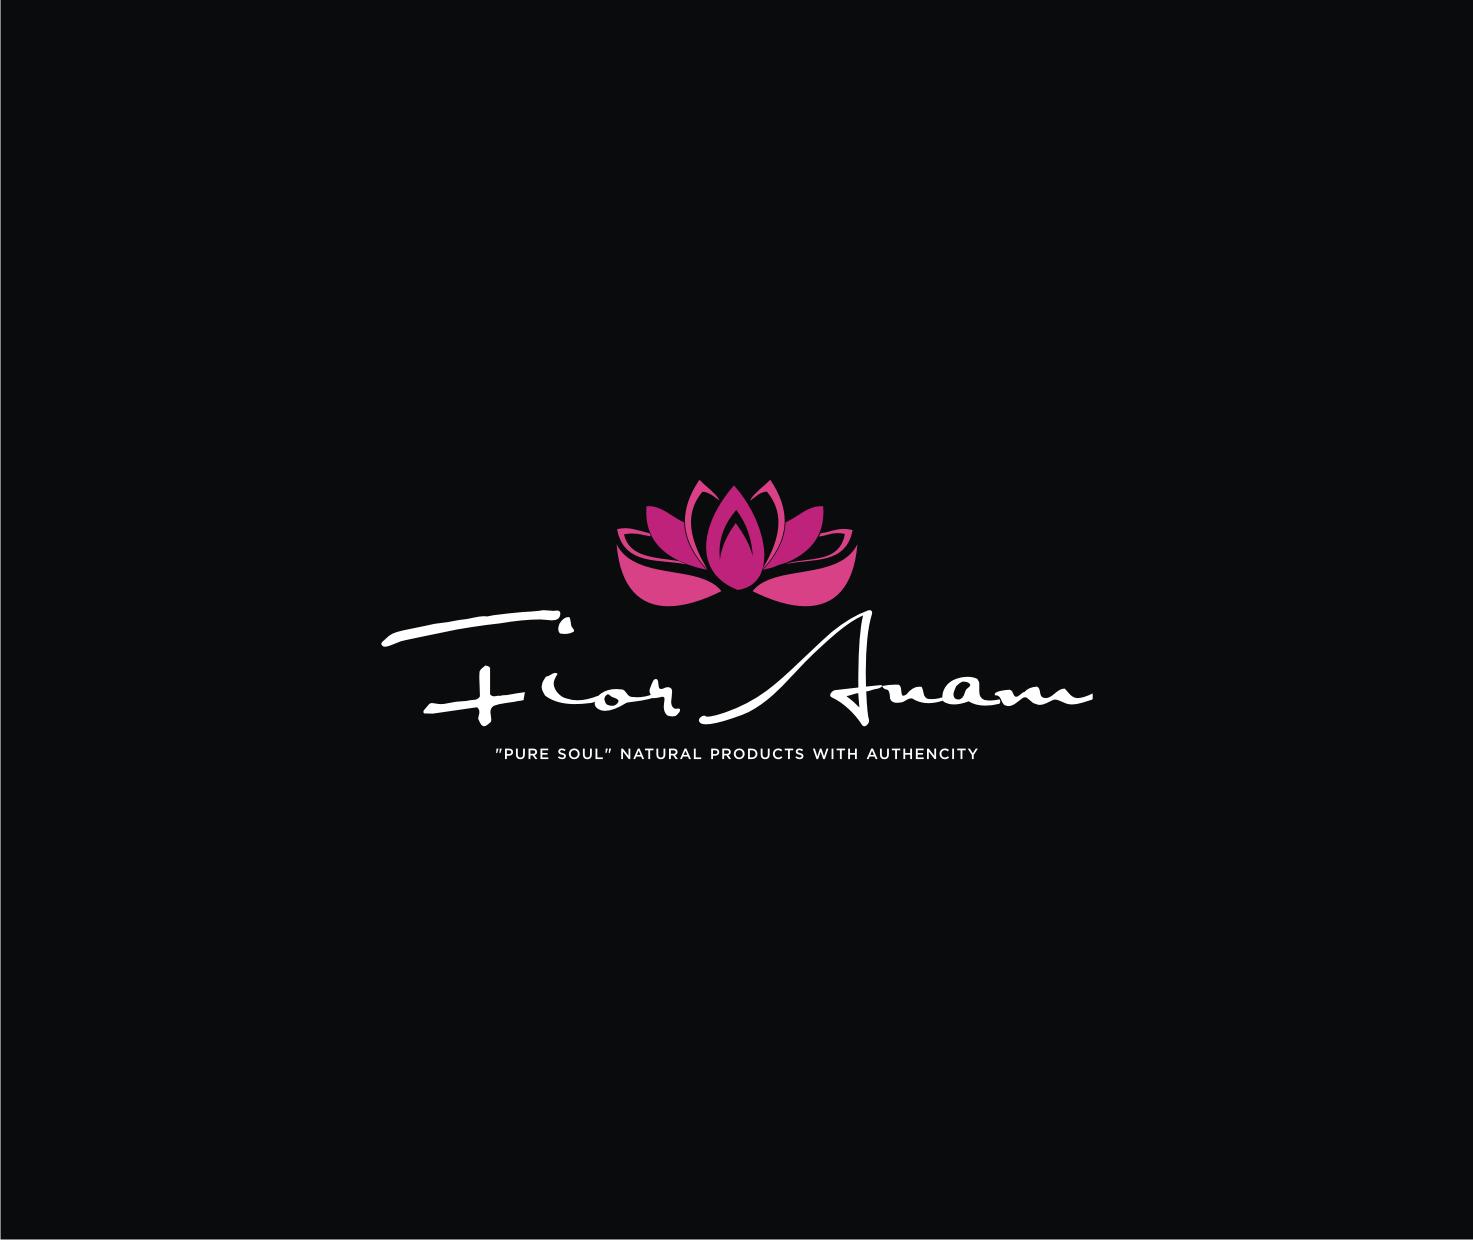 Logo Design by Sigitumarali Sigit - Entry No. 219 in the Logo Design Contest Creative Logo Design for Fior Anam.